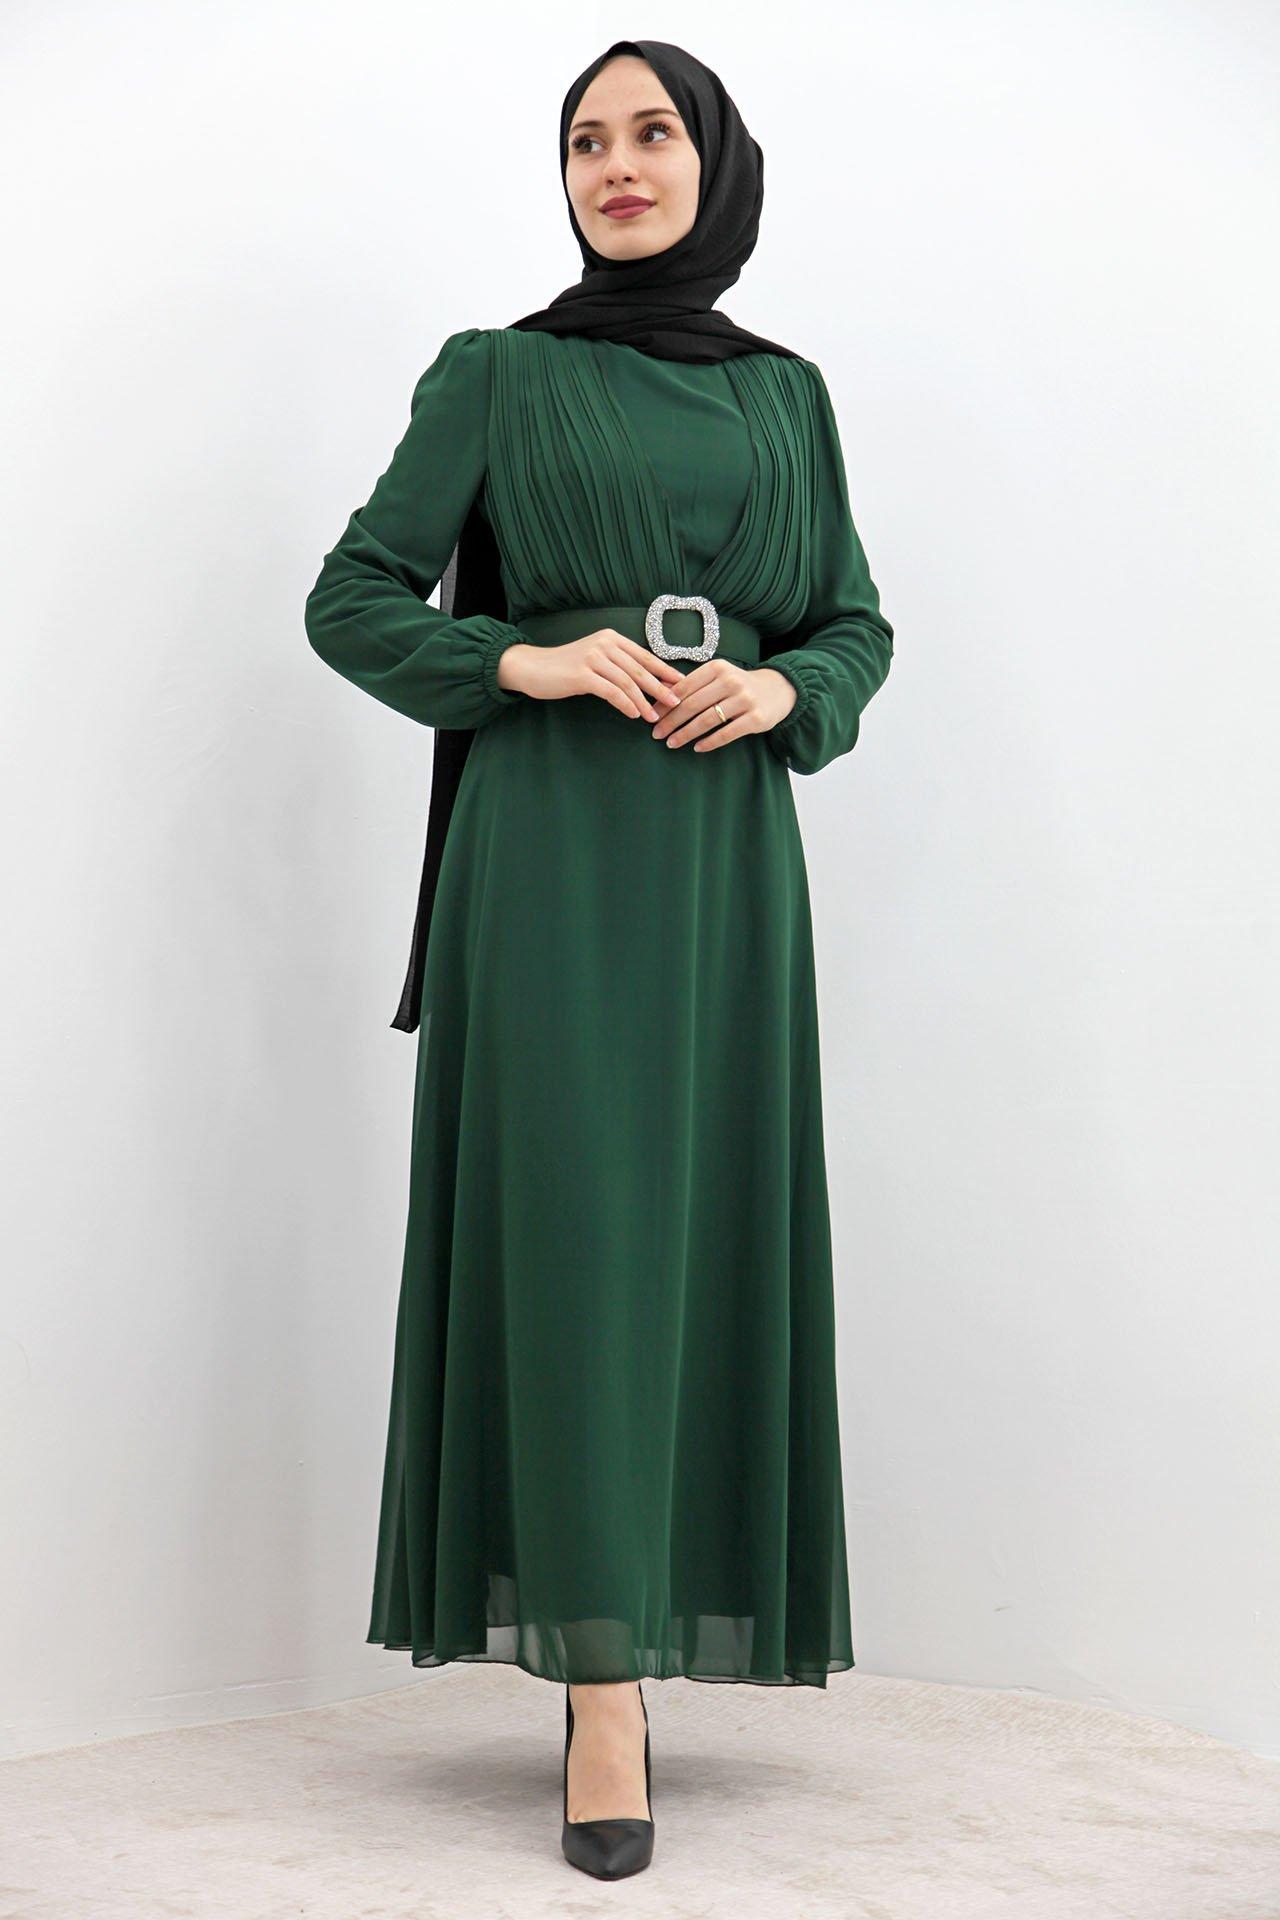 GİZAGİYİM - Taş Kemer Pilisoley Elbise Zümrüt